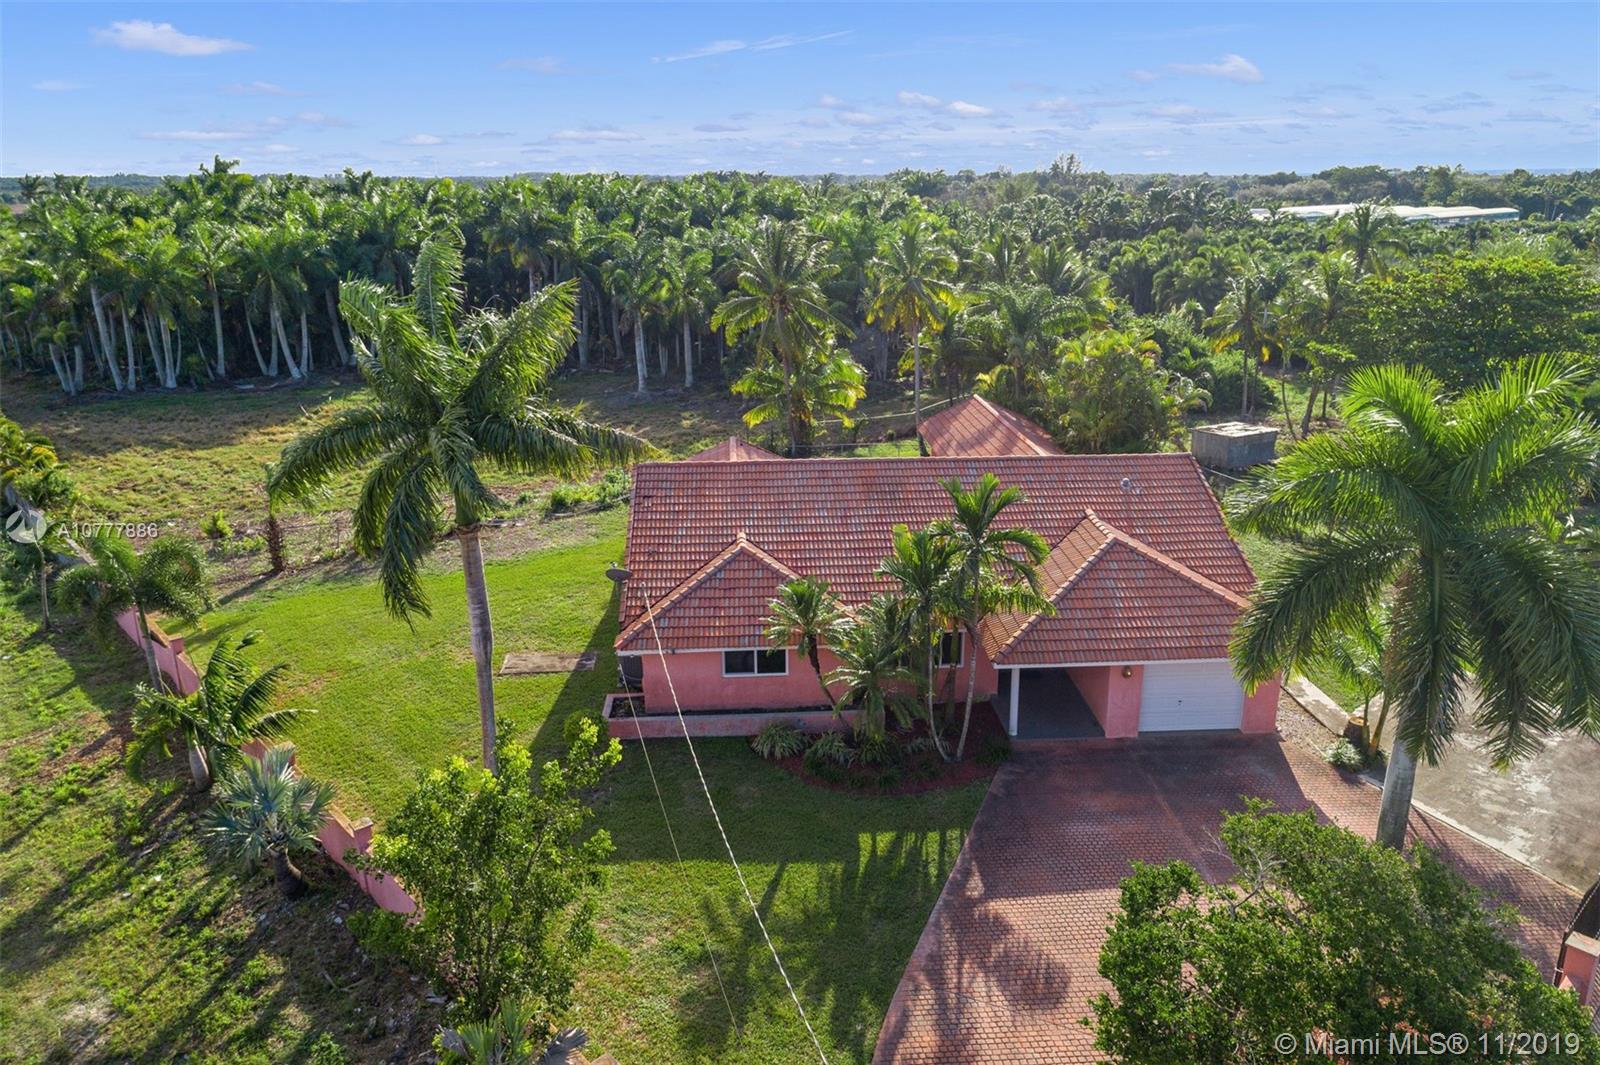 19200 SW 316th St, Homestead, FL 33030 - Homestead, FL real estate listing